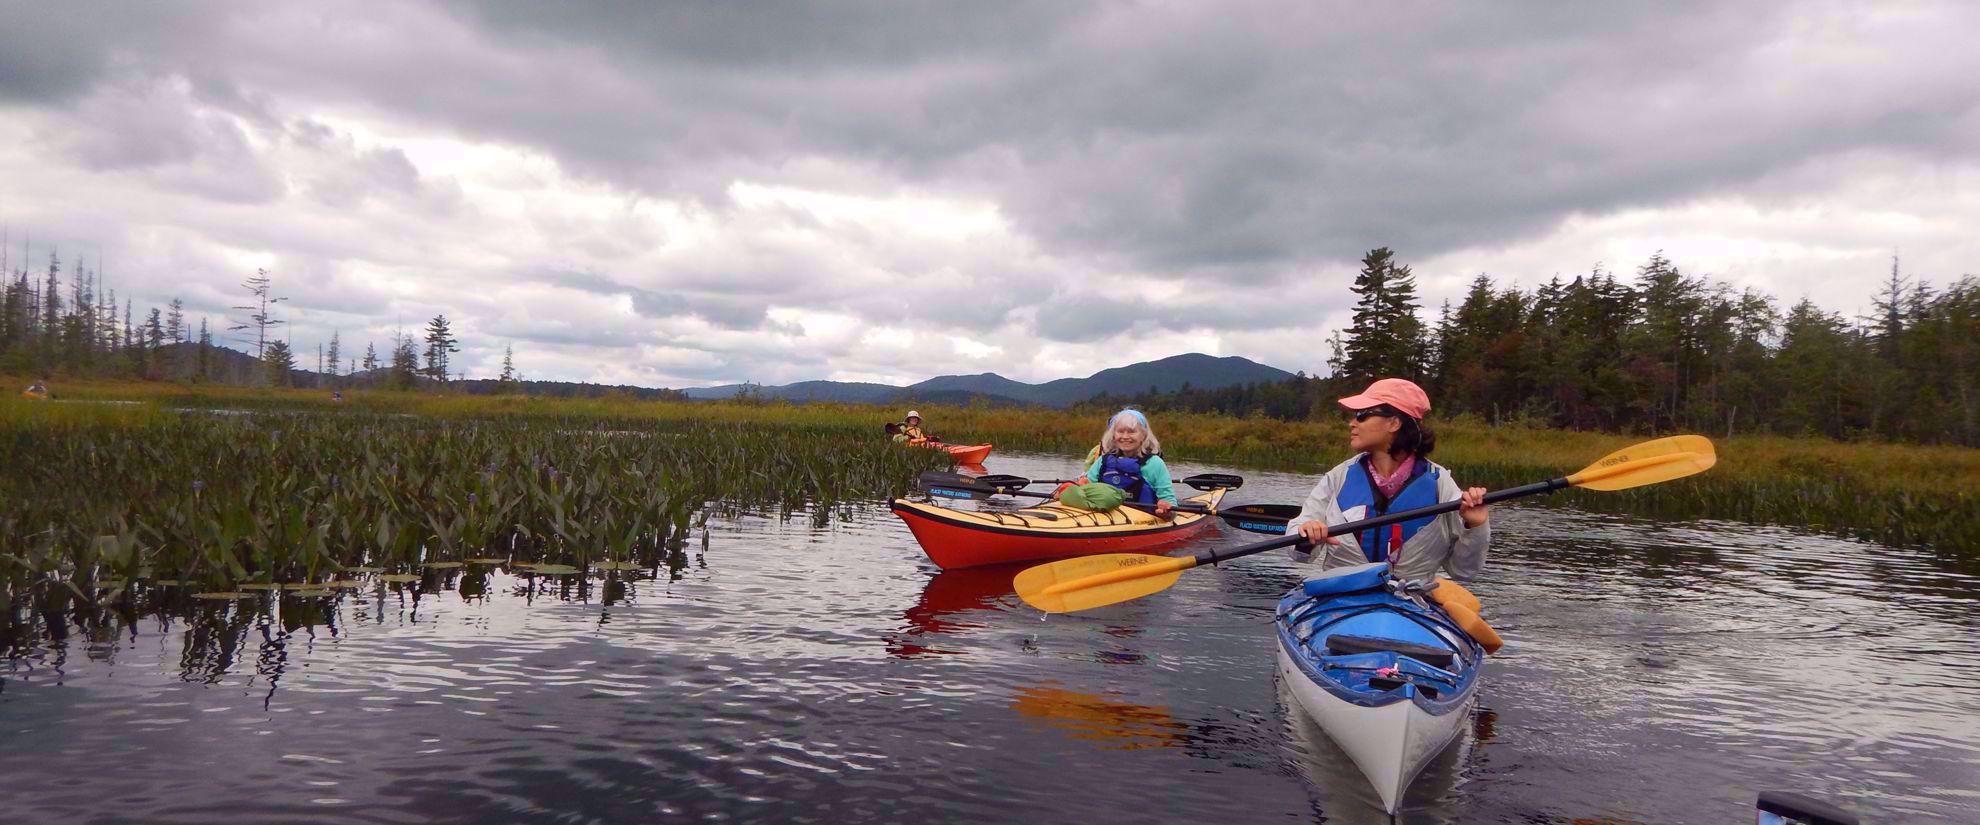 Picture of Kayaking the Adirondacks